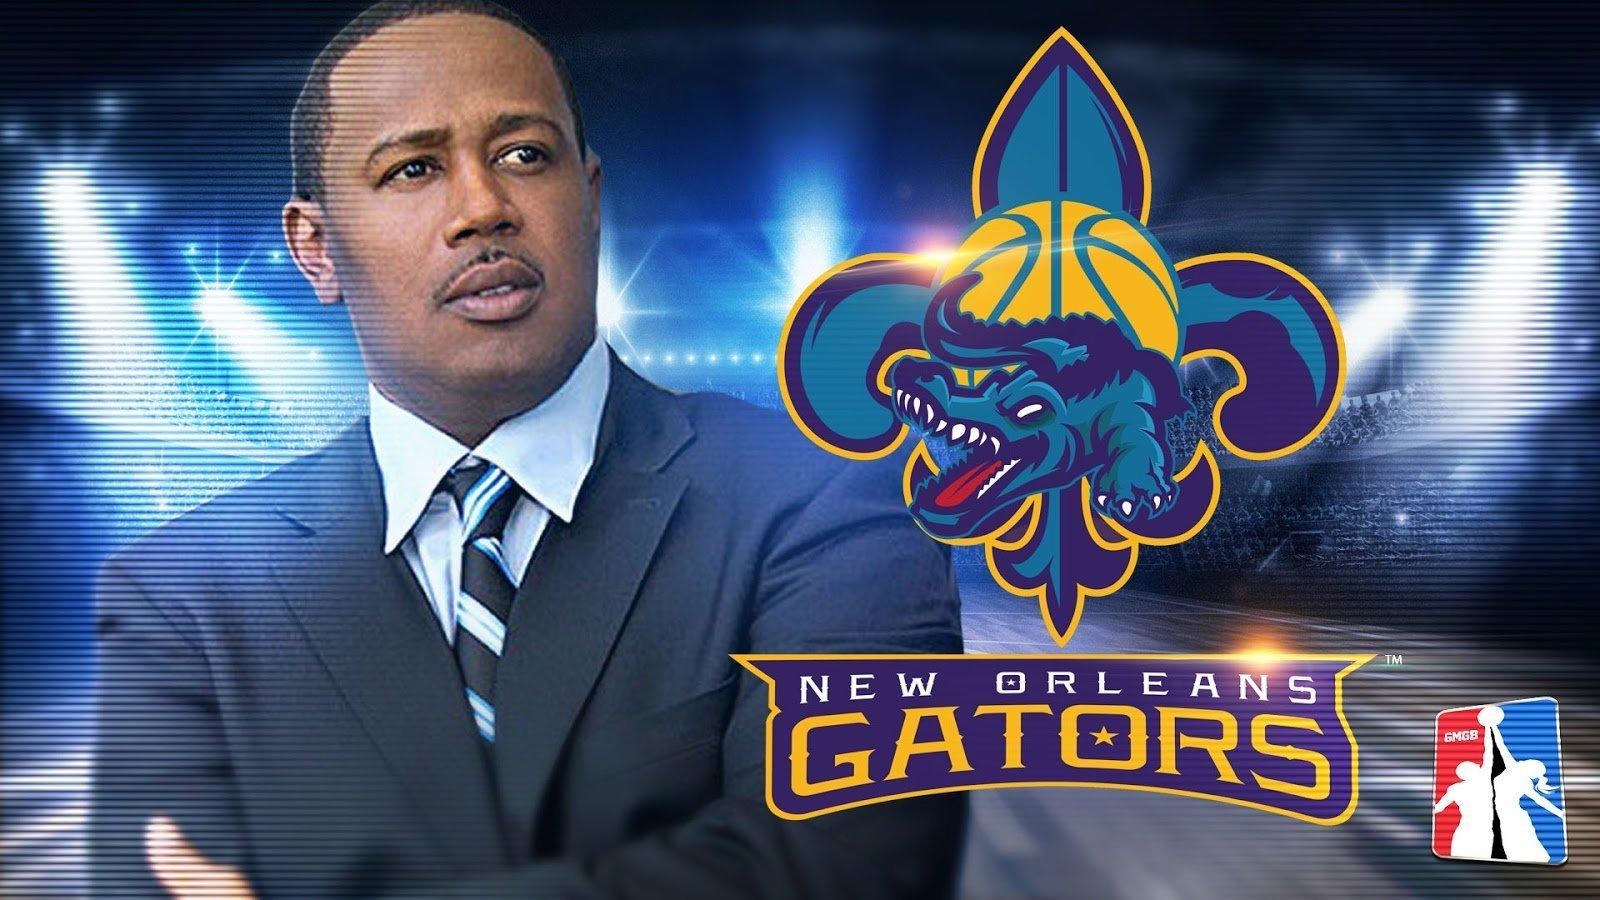 Master P Announced Owner of New Orleans Gators Basketball Franchise